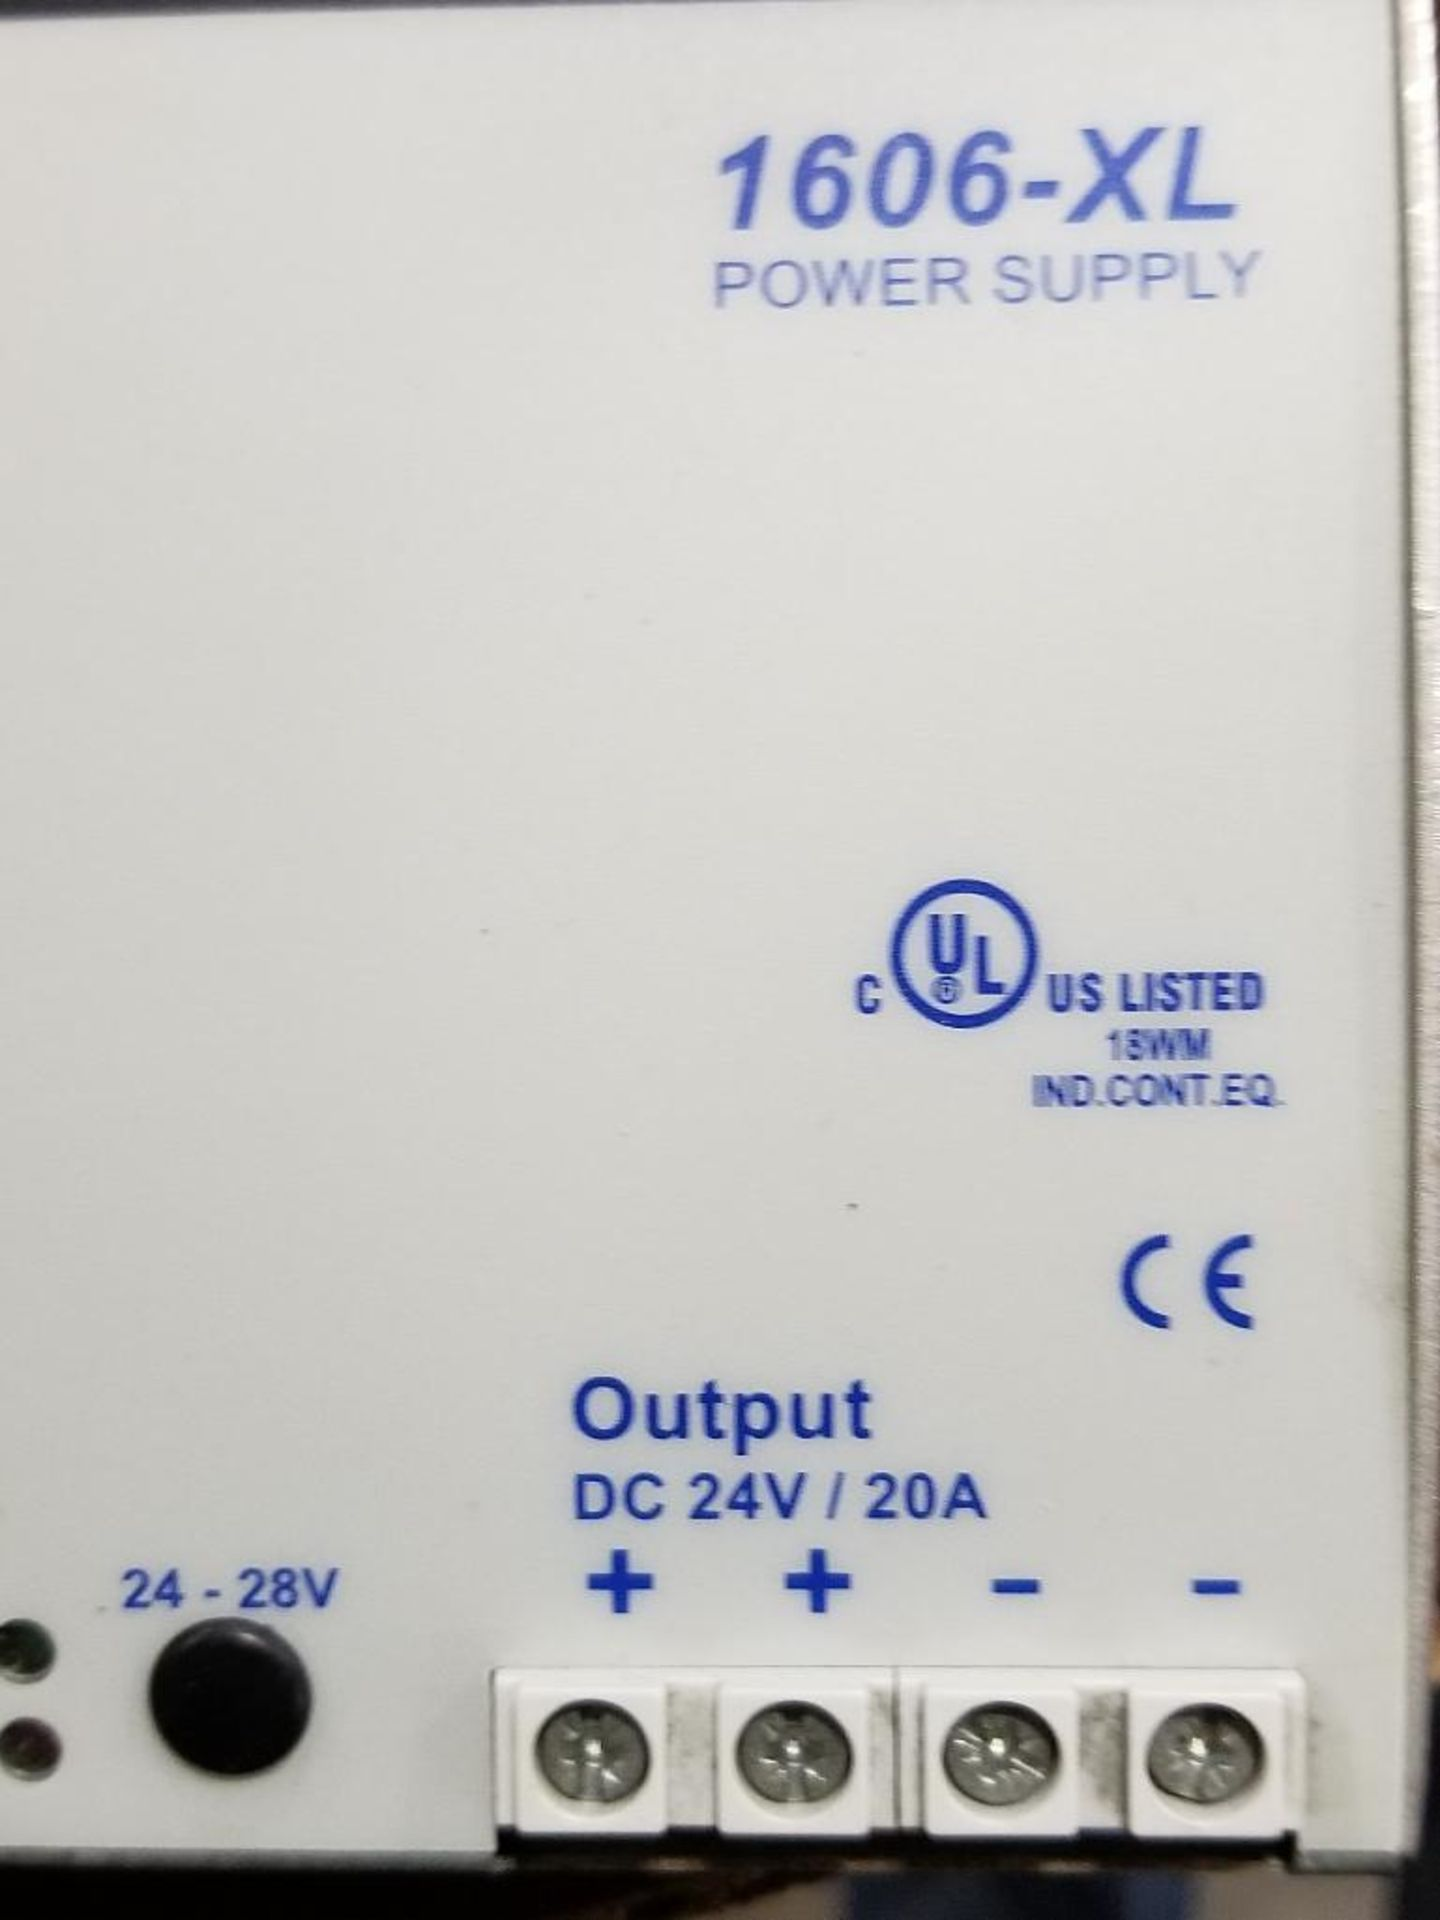 Allen Bradley 1606-XL power supply. 1606-XL480E. - Image 2 of 4